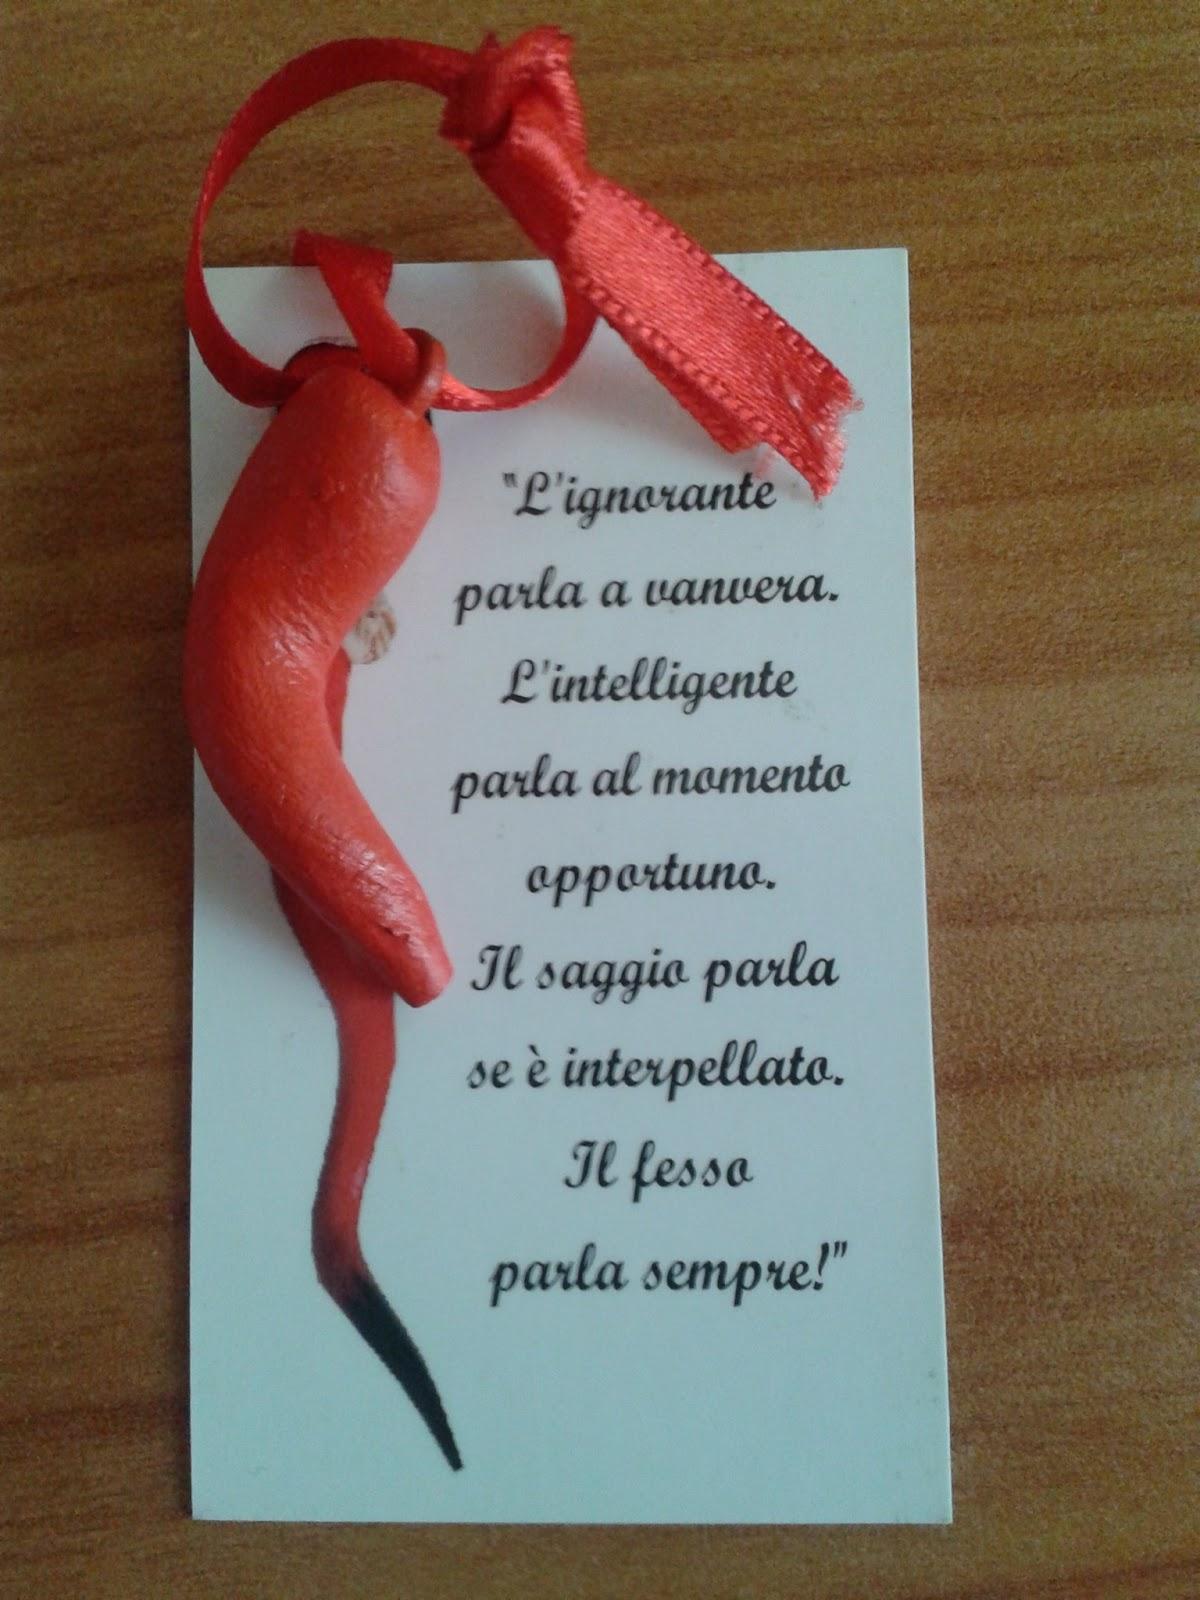 Auguri Matrimonio In Napoletano : Videobox emmanuel matrimonio a sorrento